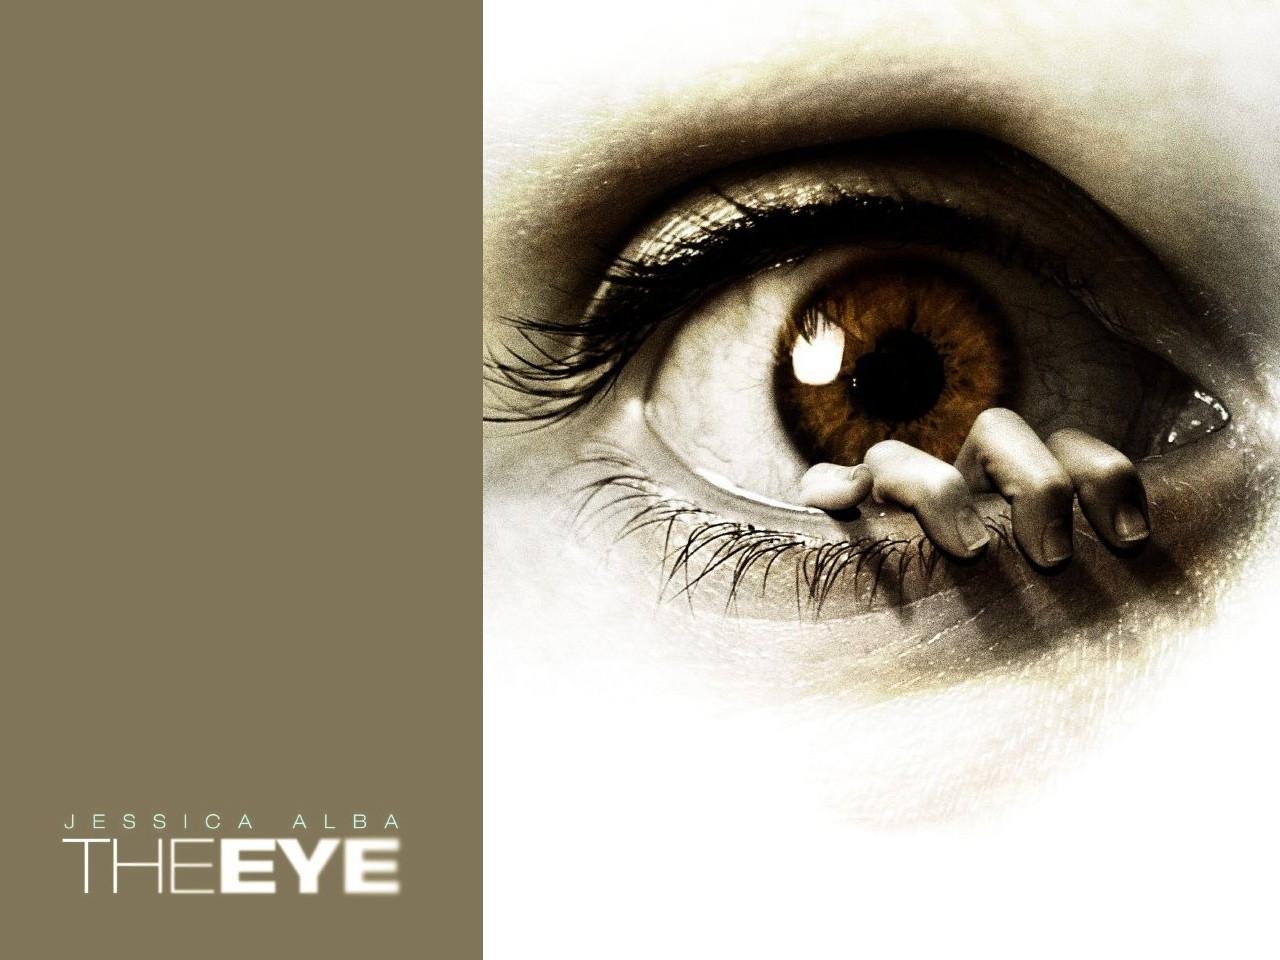 un wallpaper del film The Eye